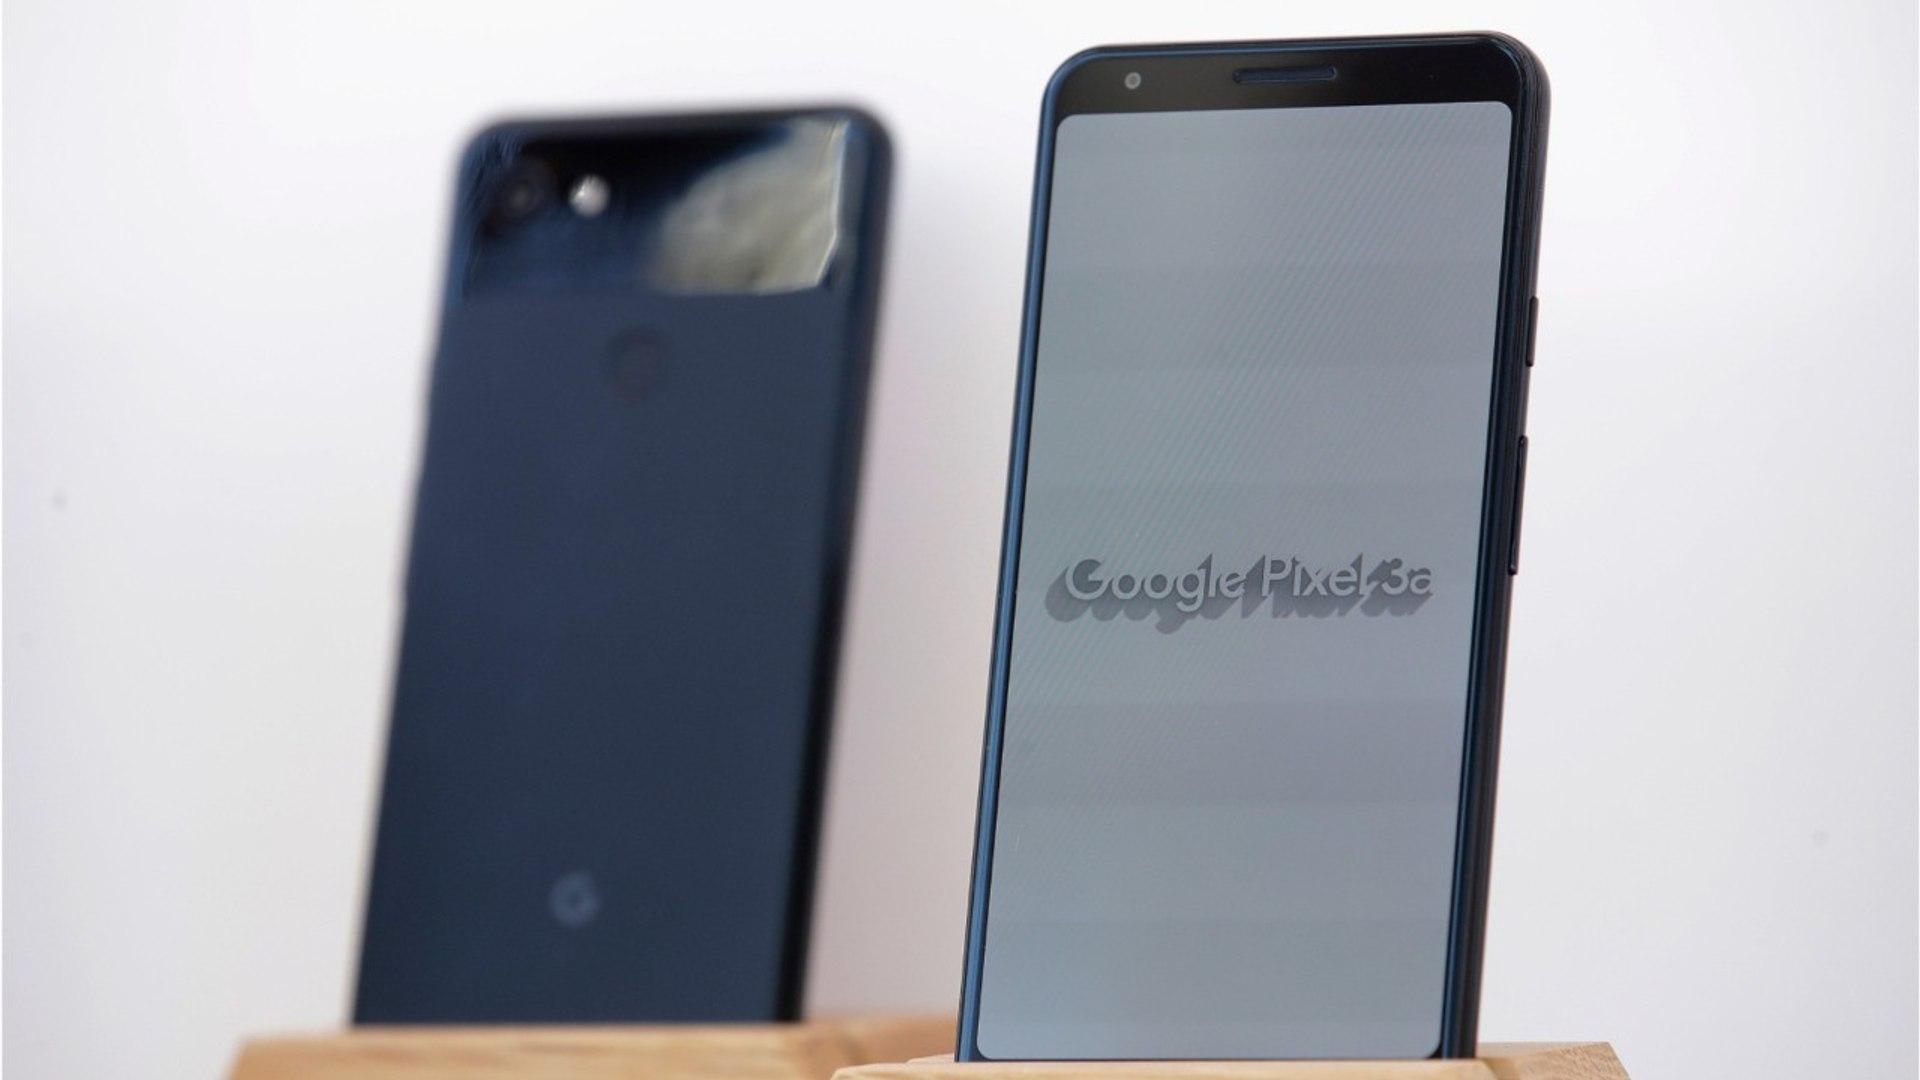 Google Releases New Budget Pixel Phone